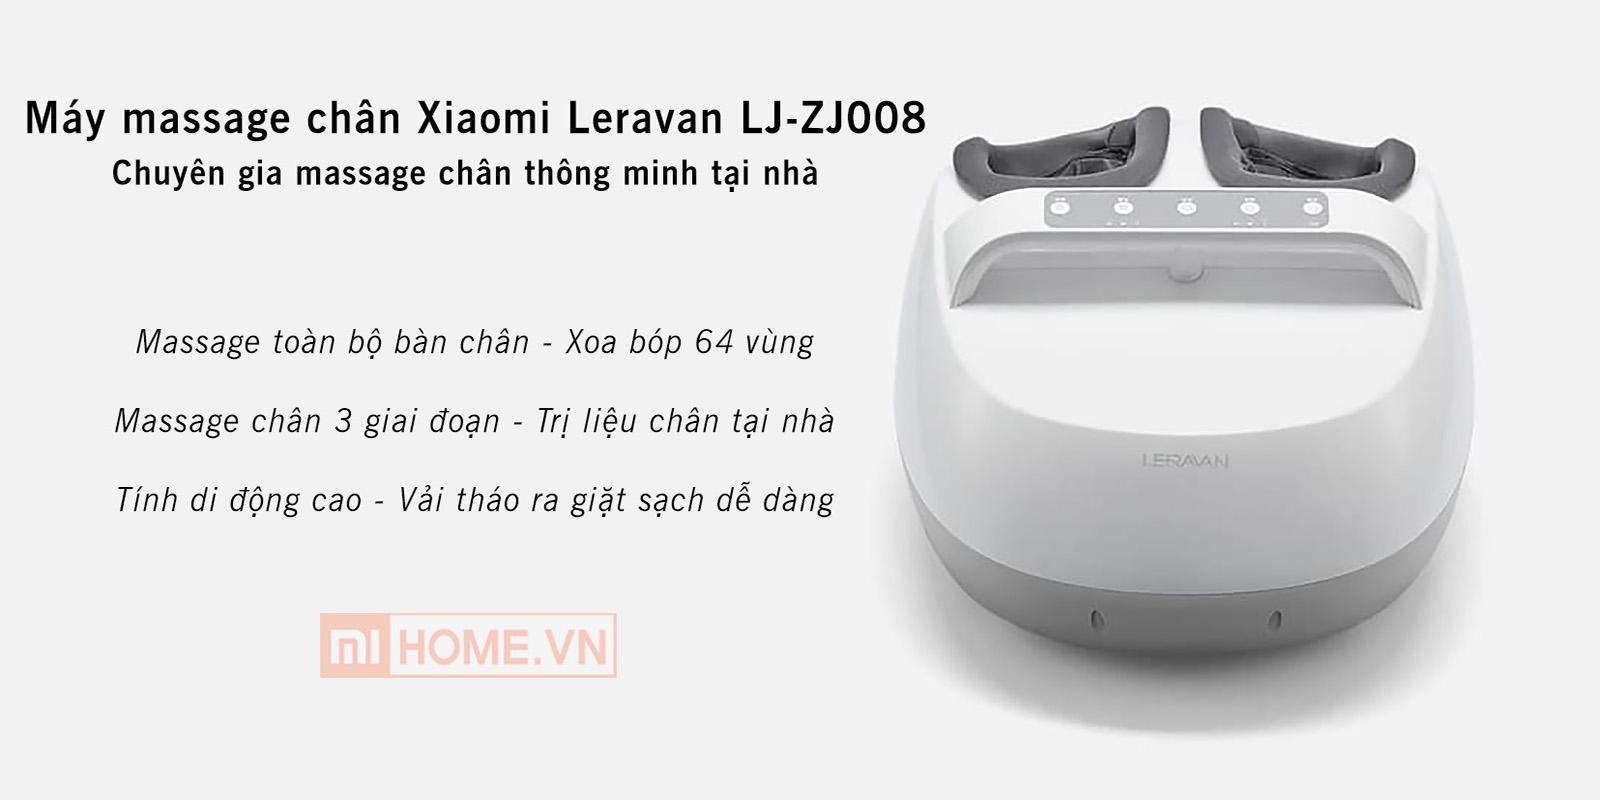 may-massage-chan-bam-huyet-xiaomi-leravan-lj-zj008